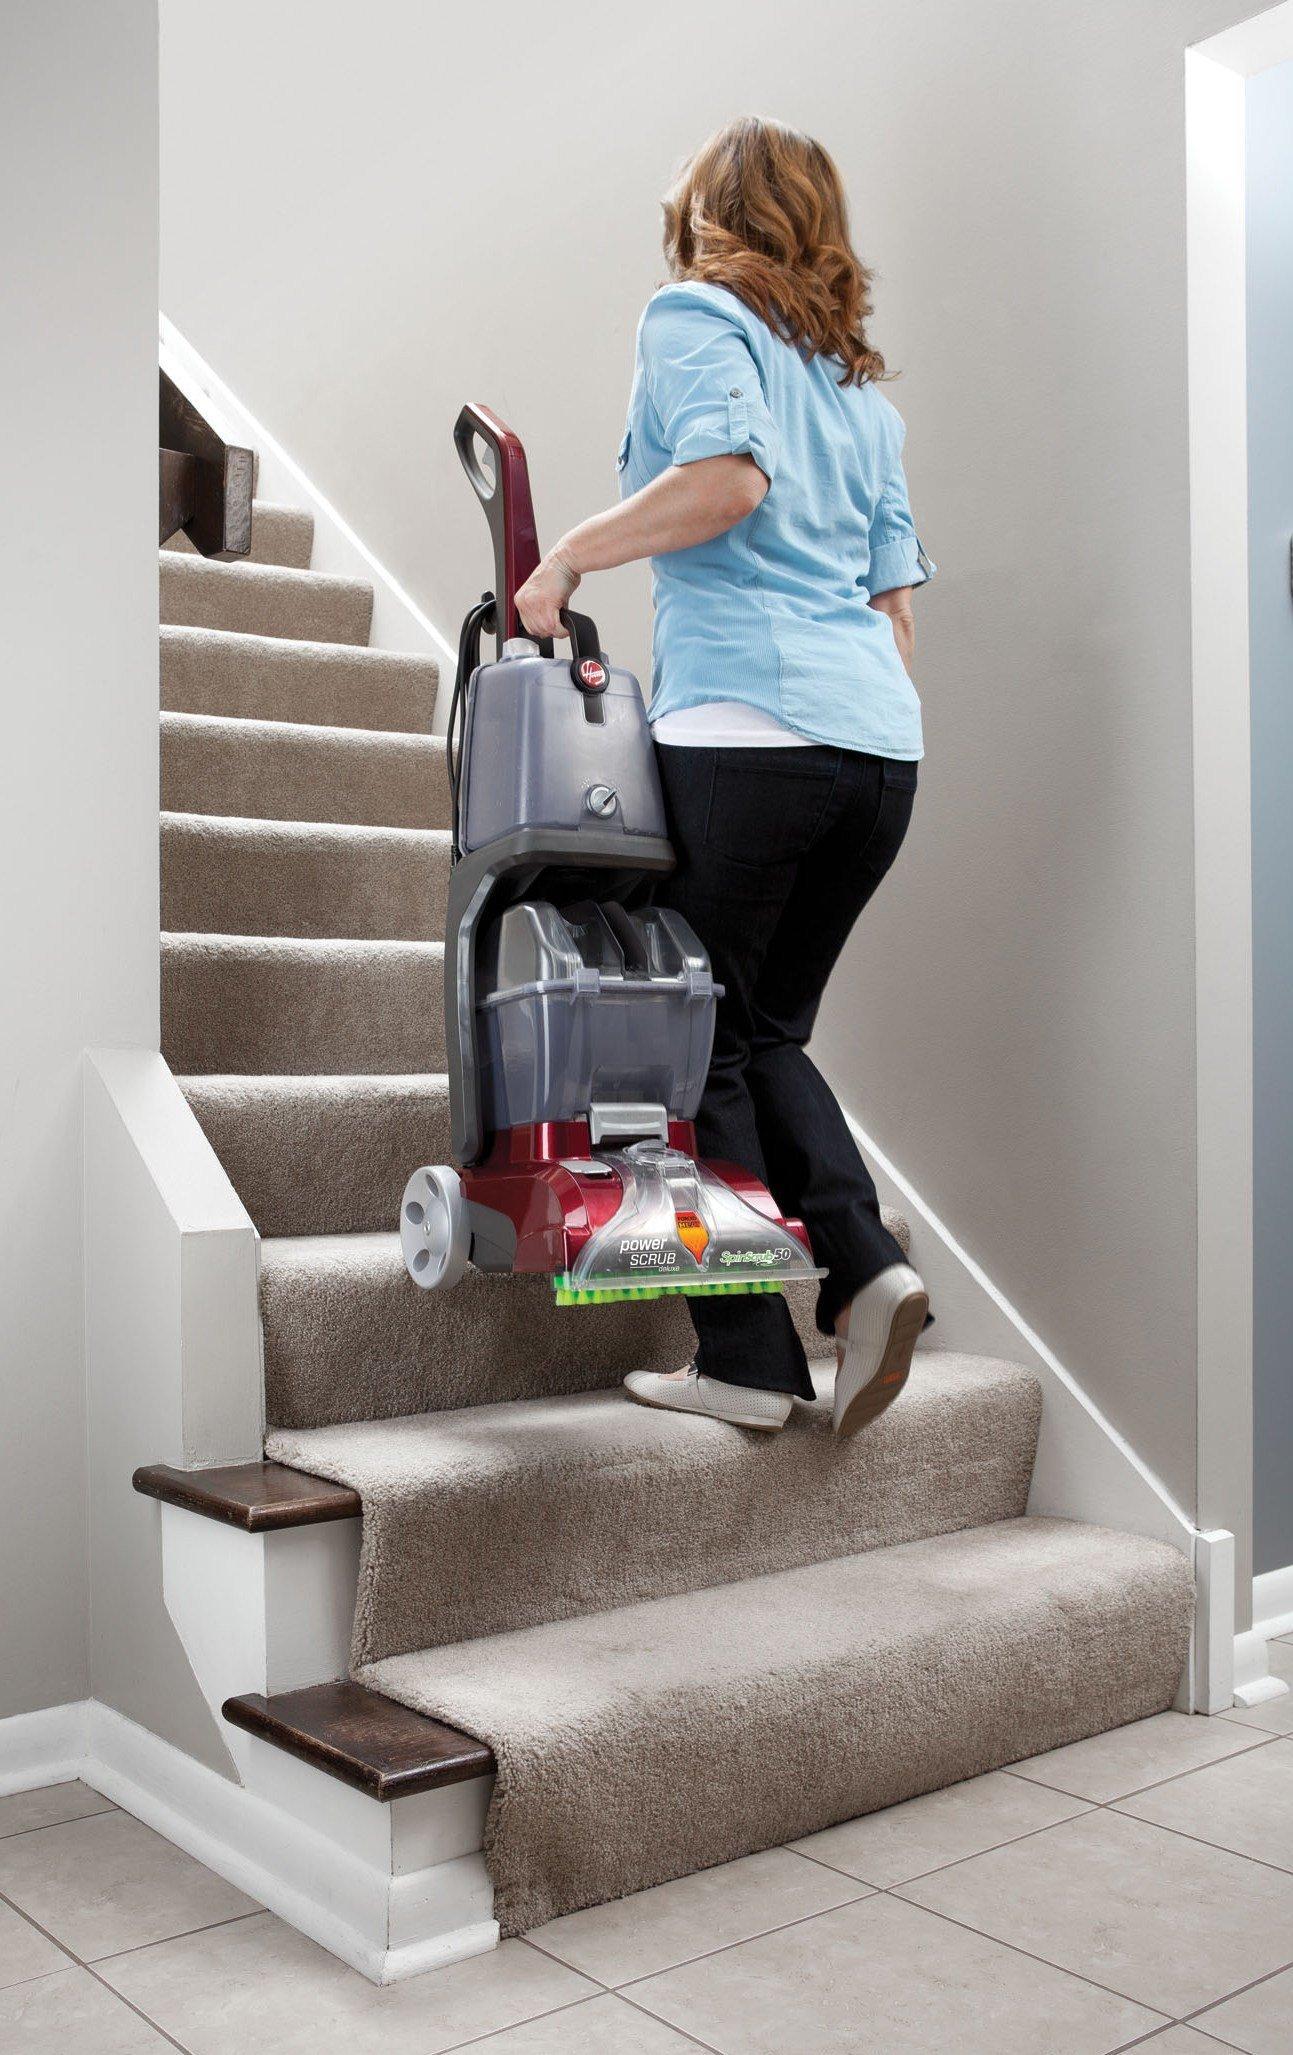 Hoover® Power Scrub Deluxe Carpet Cleaner4